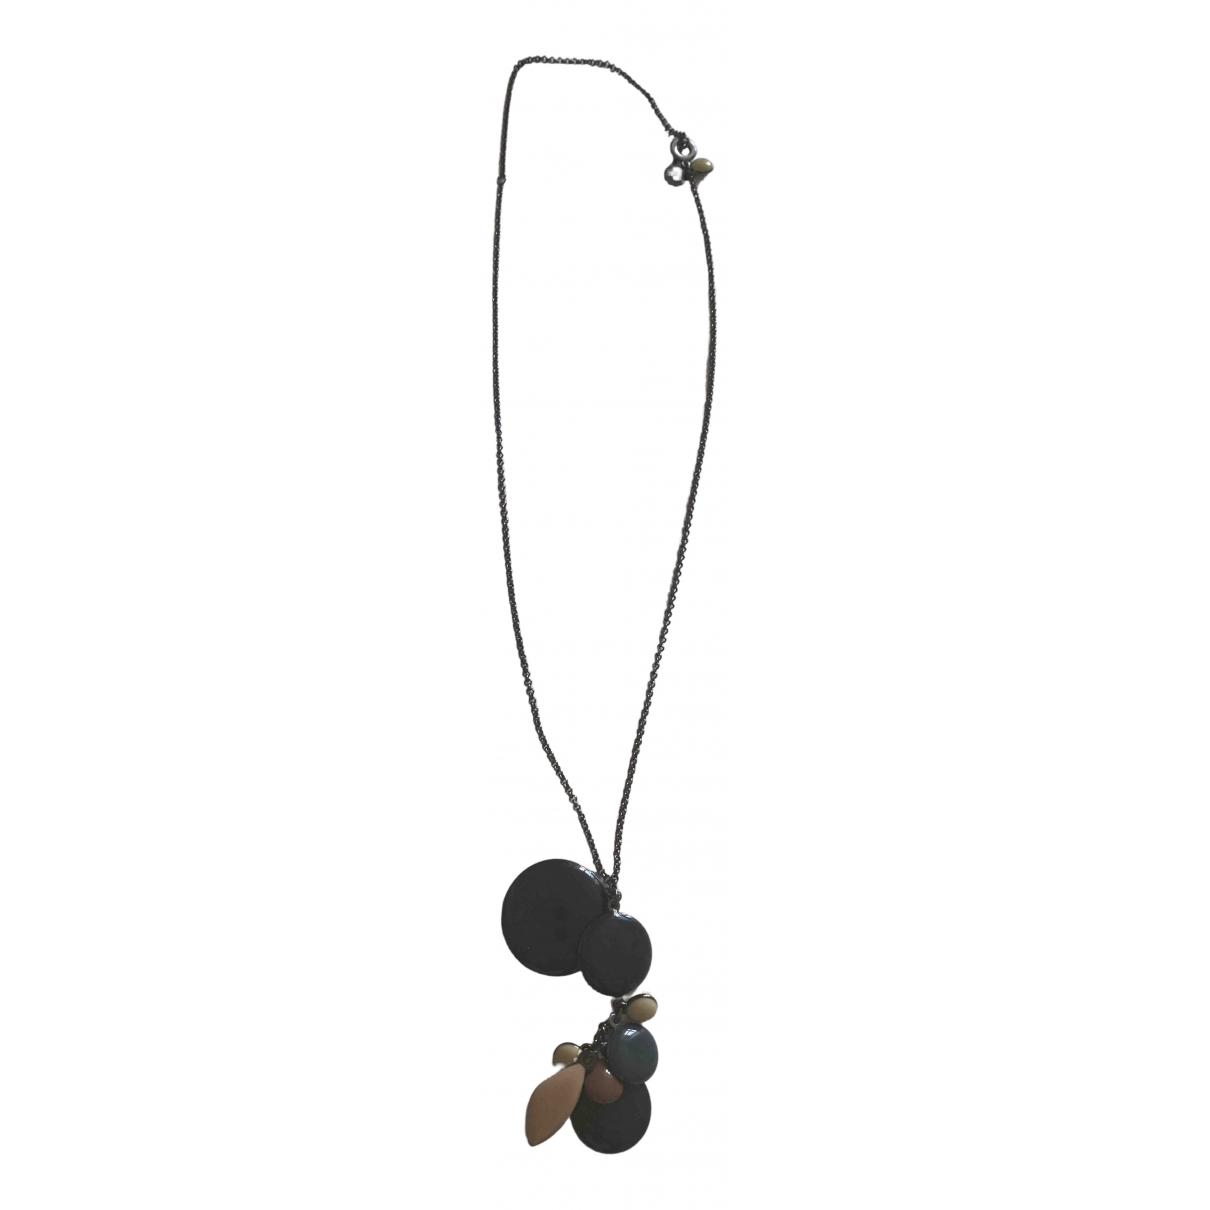 Les Néréides \N Anthracite Metal necklace for Women \N